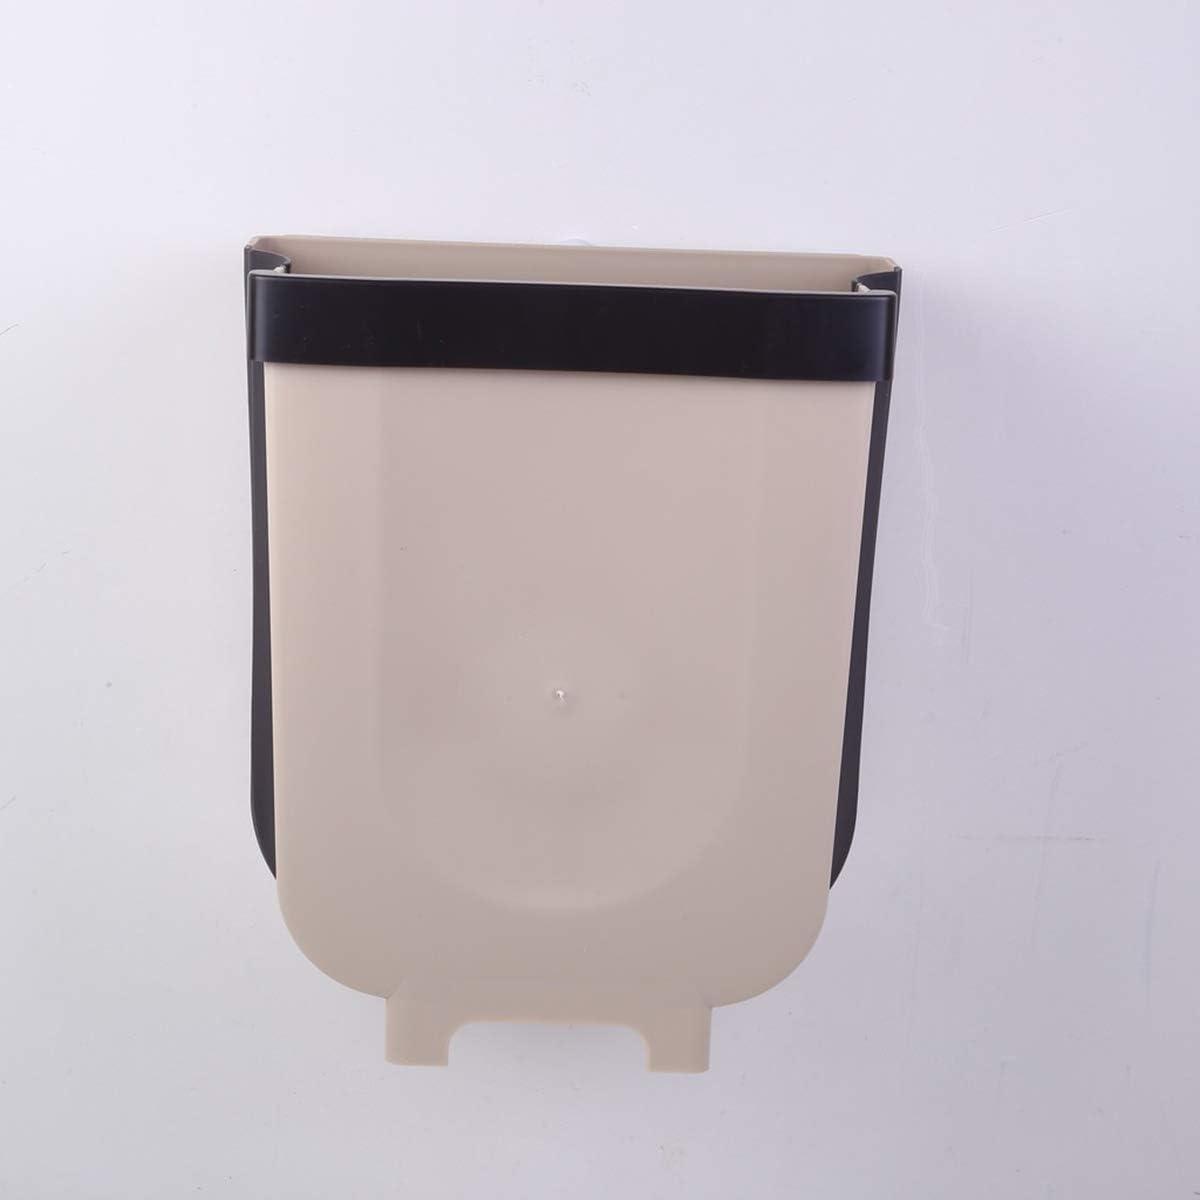 DERCLIVE Folding Waste Bin Kitchen Cabinet Door Hanging Trash Can for Home Car Office Dorms Living Rooms